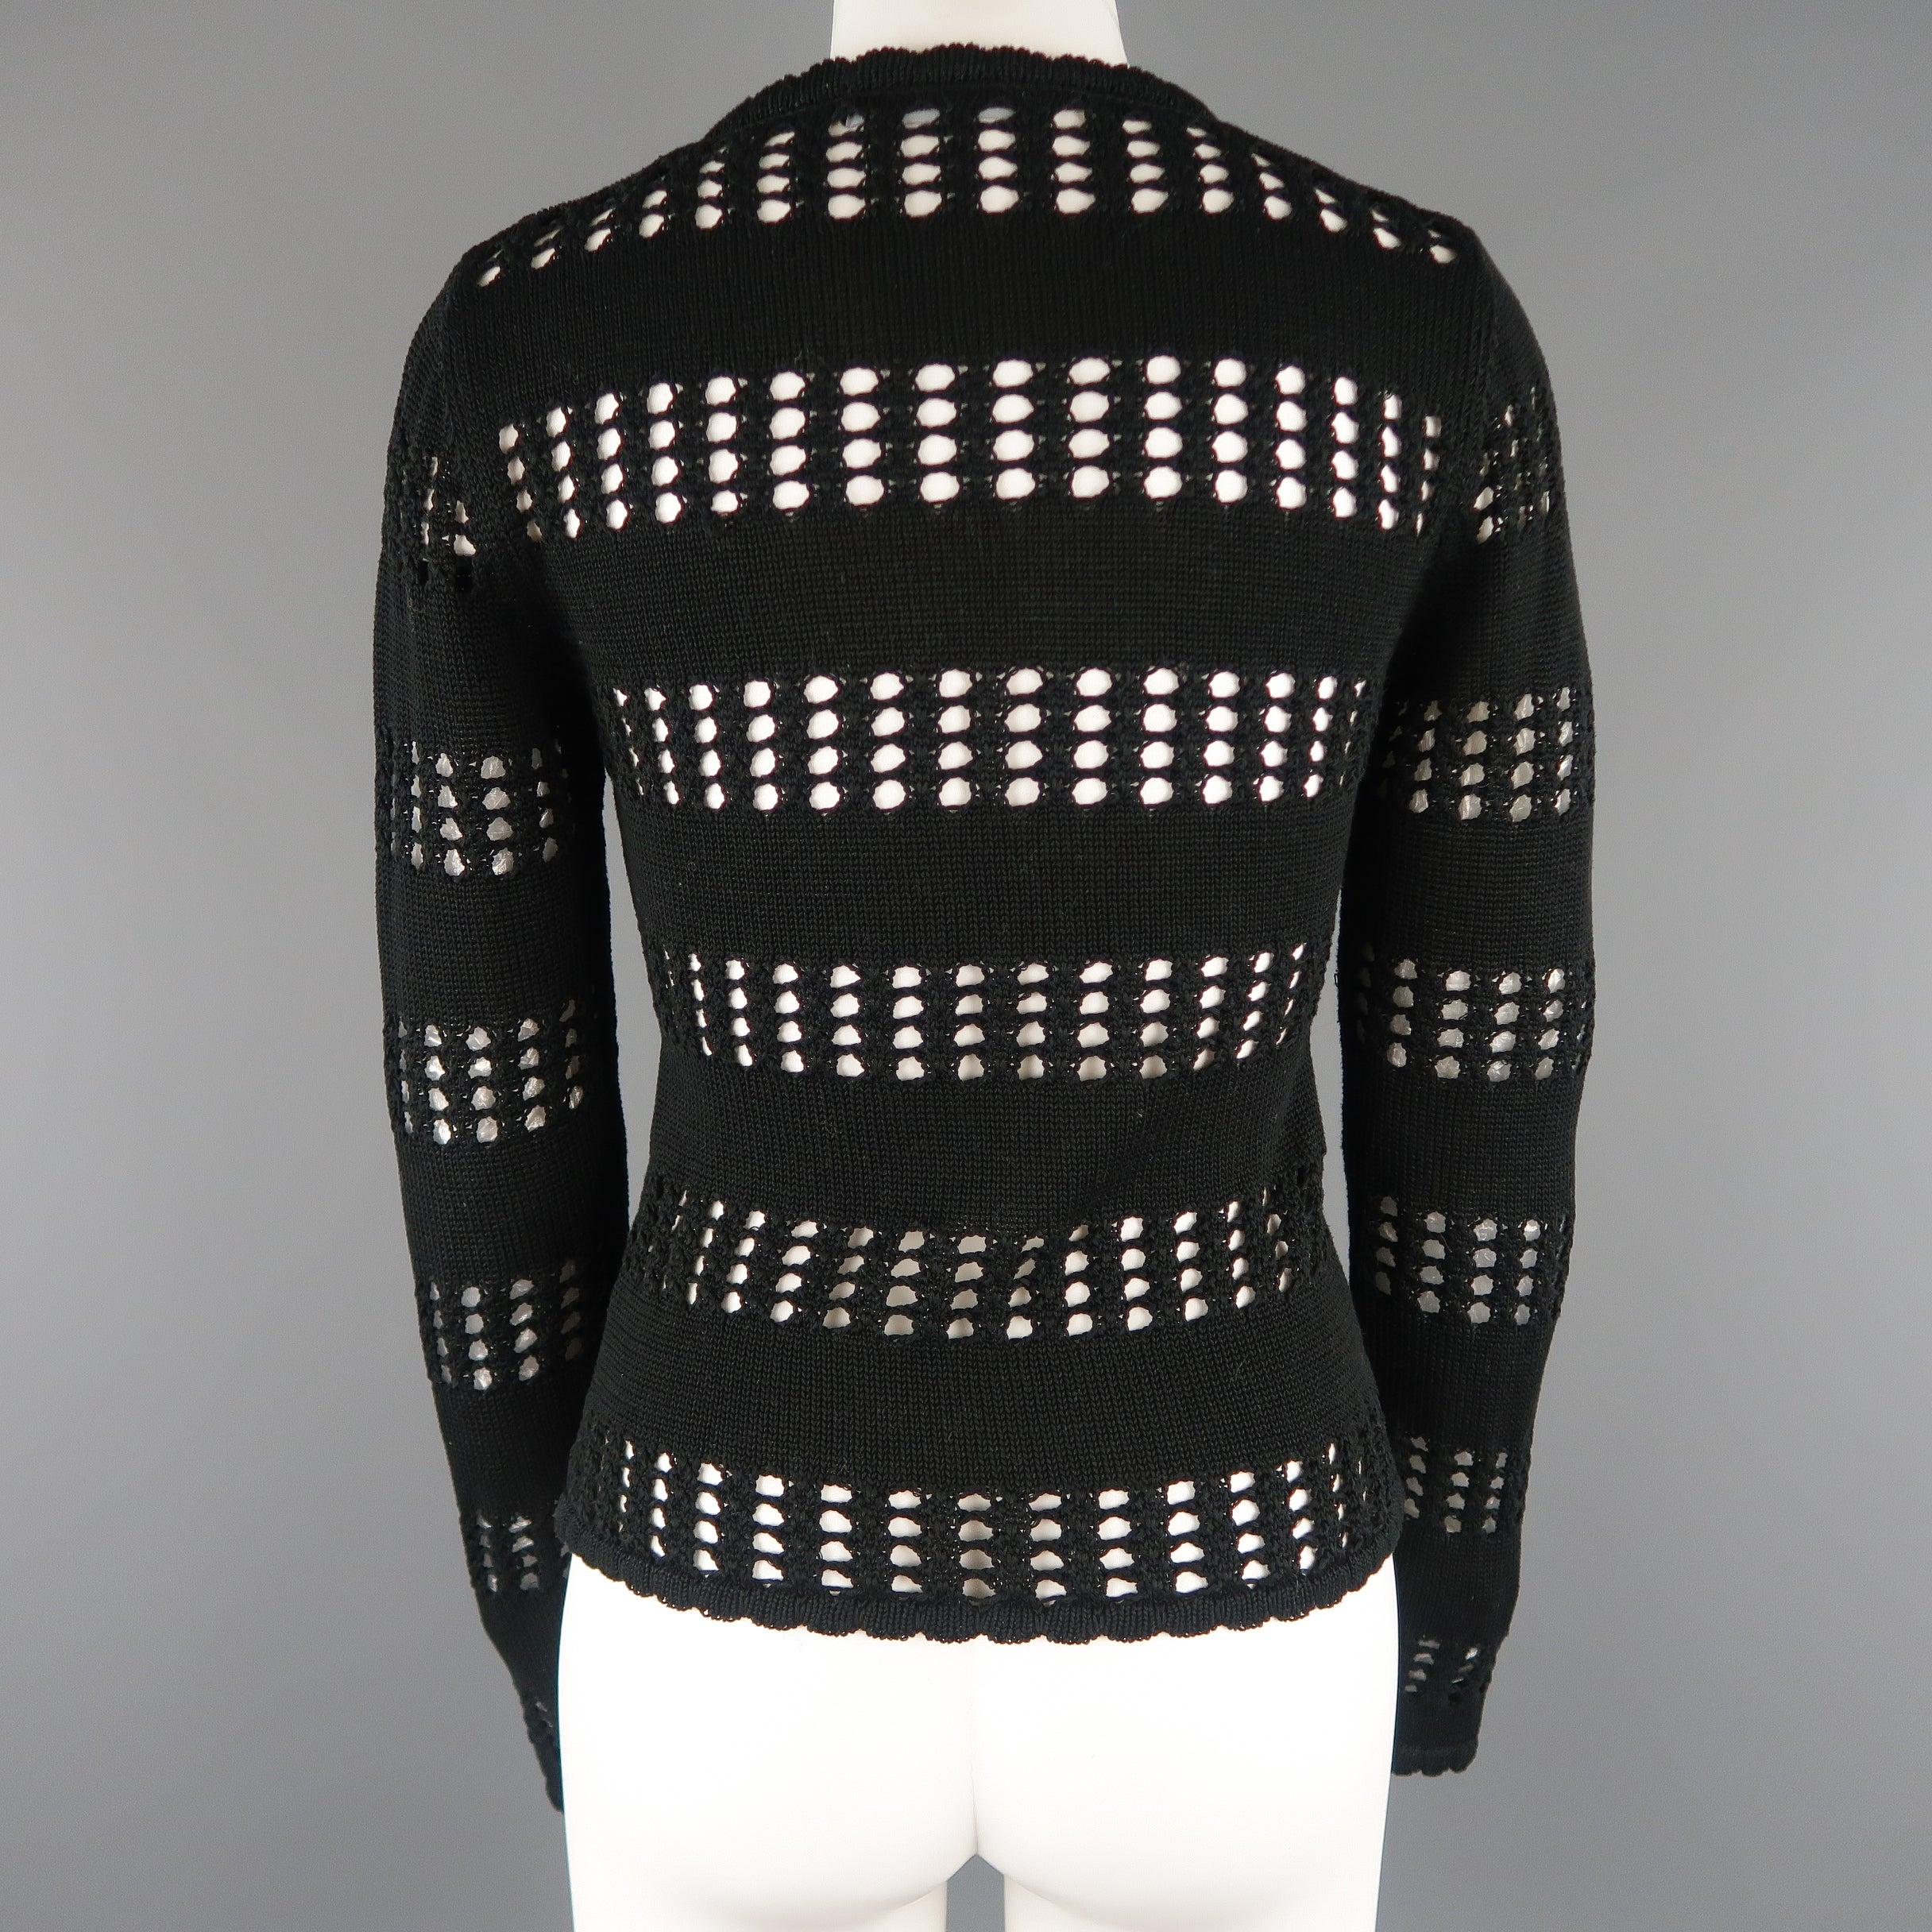 03b581795c DOLCE and GABBANA Size 2 Black Cotton Mesh Stripe Ruffle Cardigan Sweater  at 1stdibs